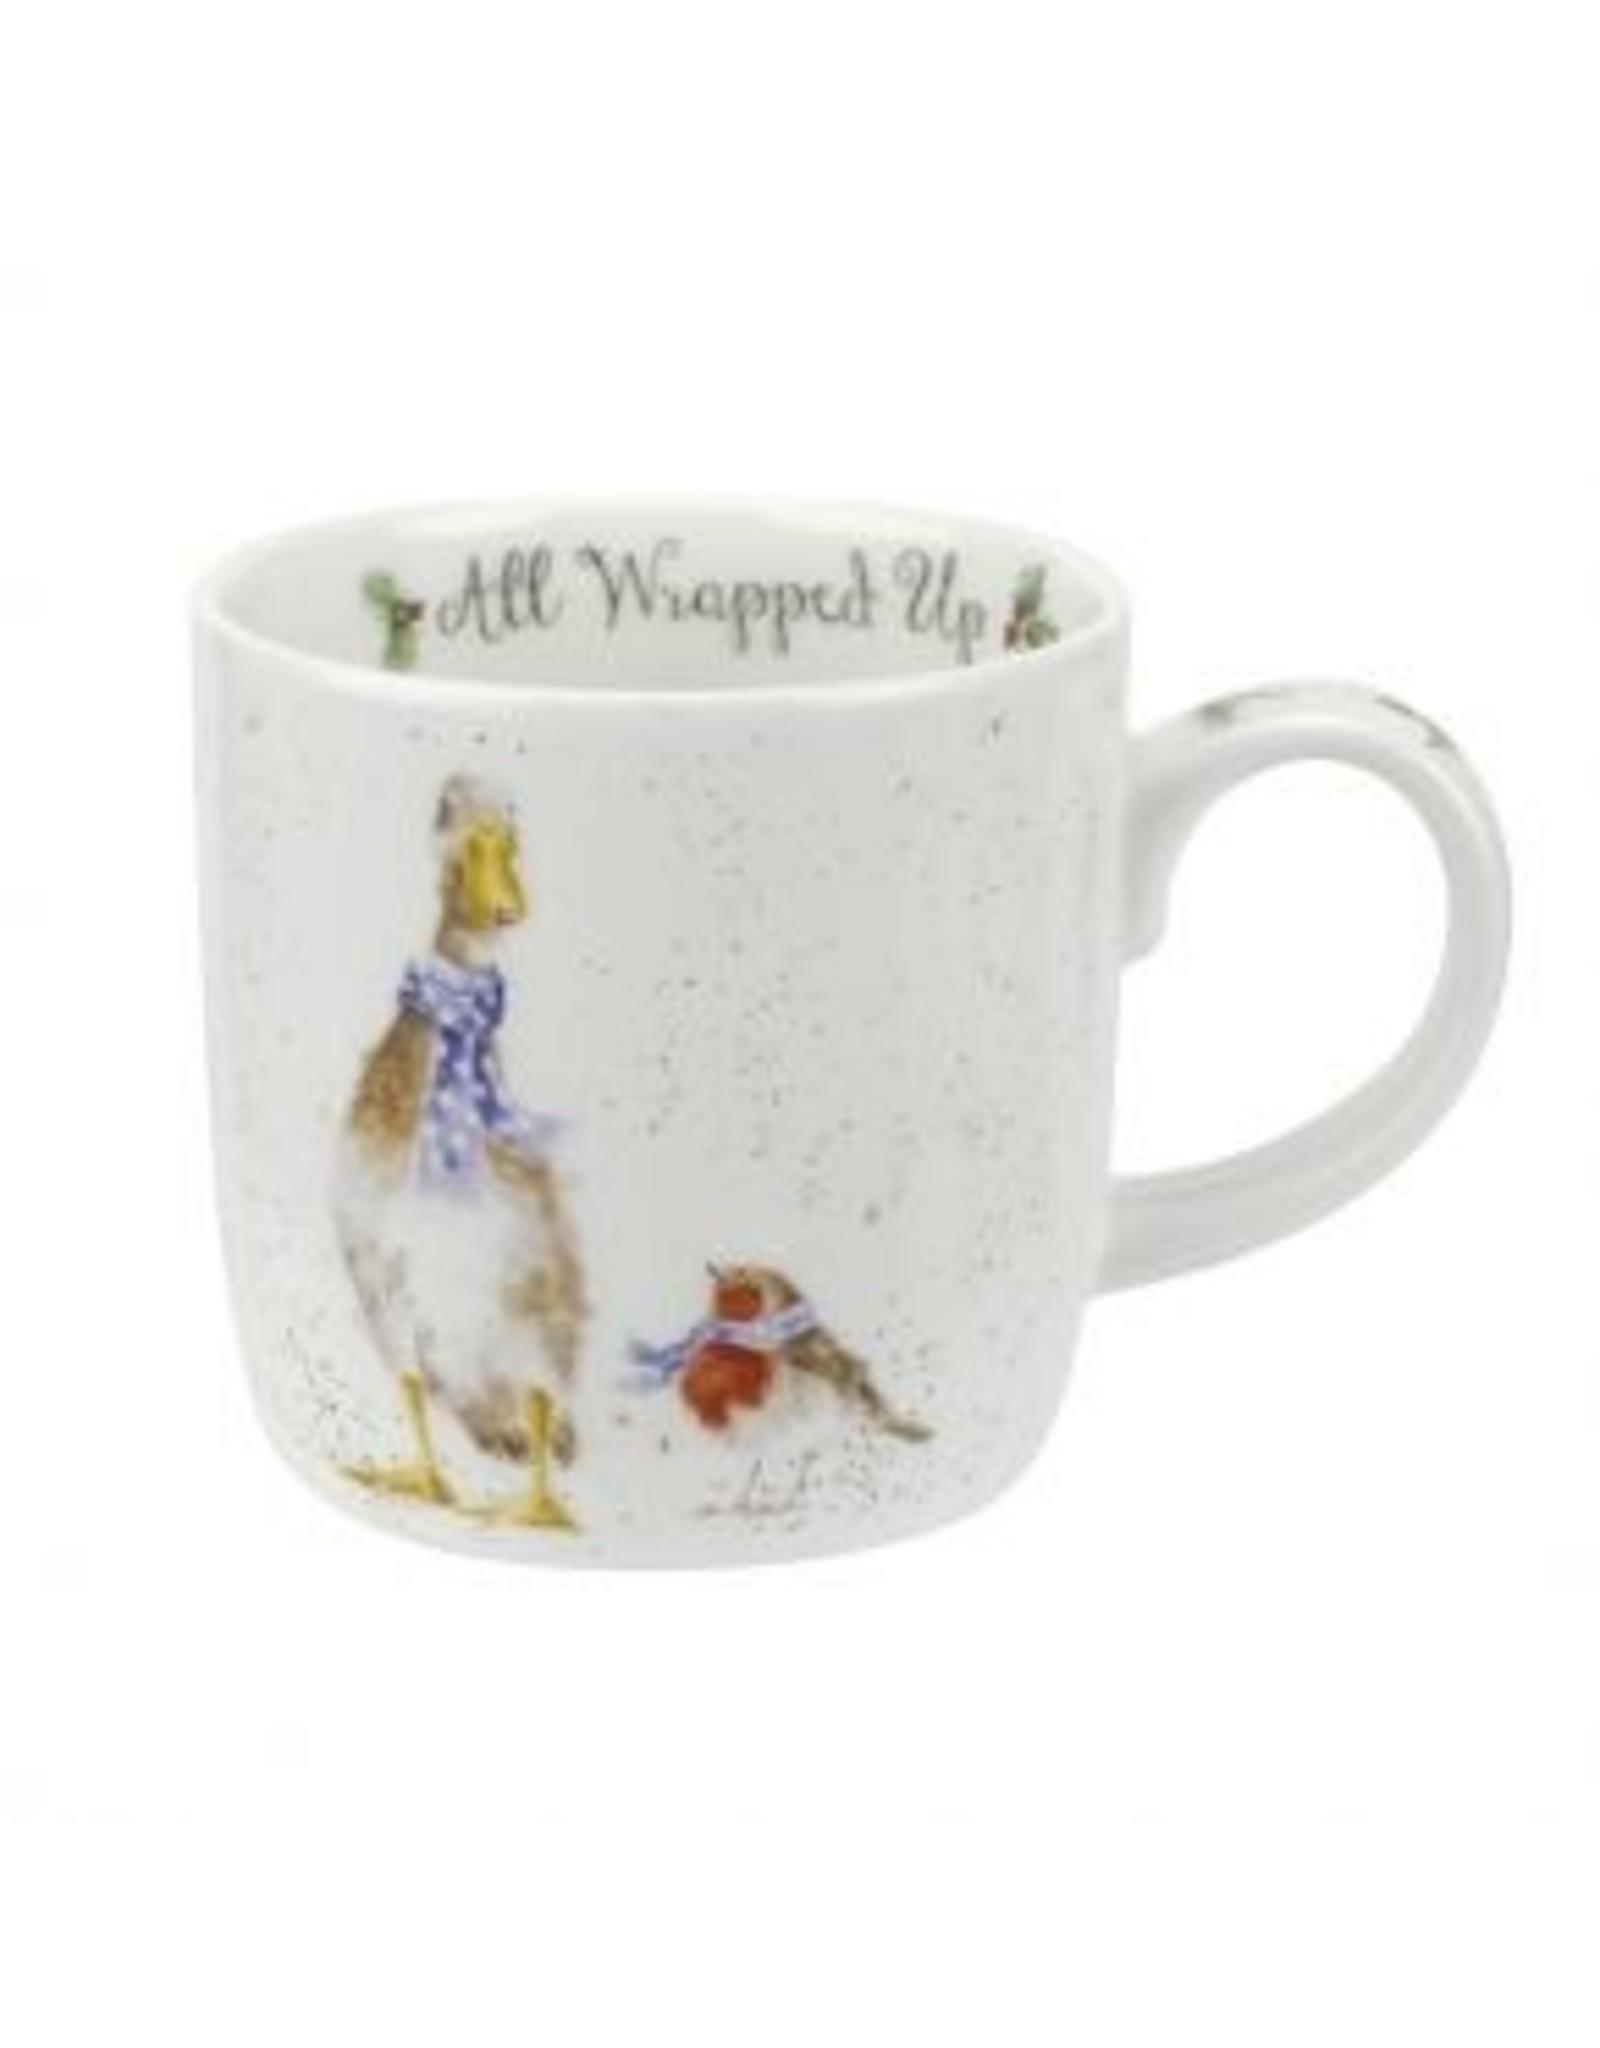 Wrendale Designs  Mug 11 oz - All Wrapped Up